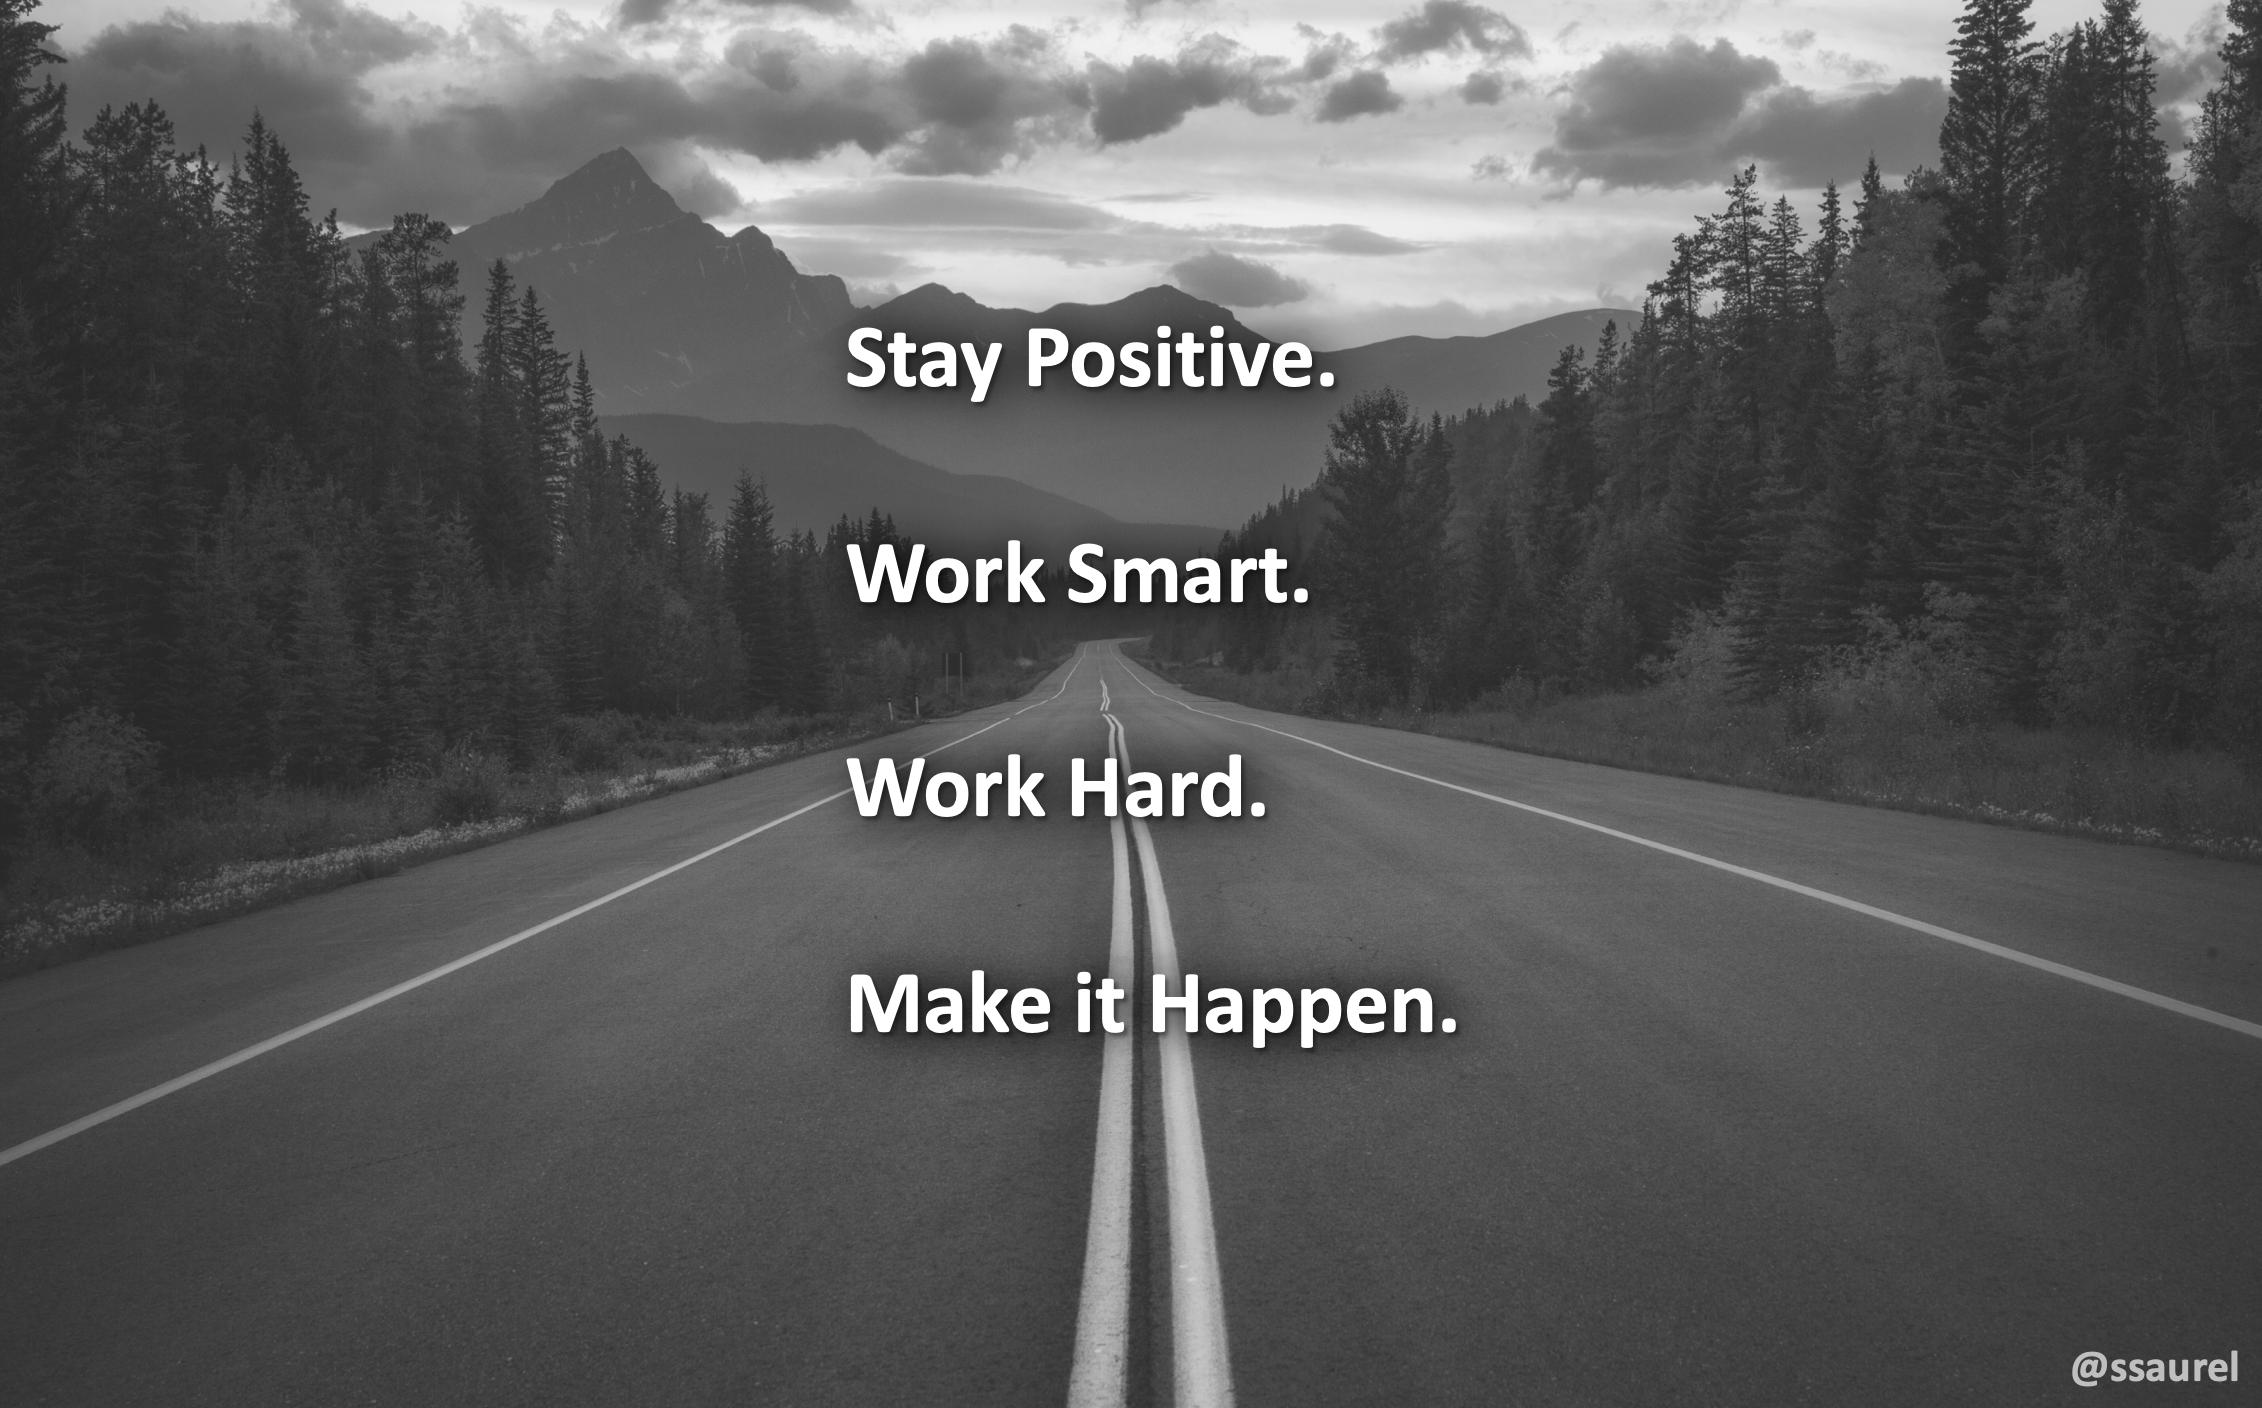 [Image] Stay Positive. Work Smart. Work Hard. Make it Happen.